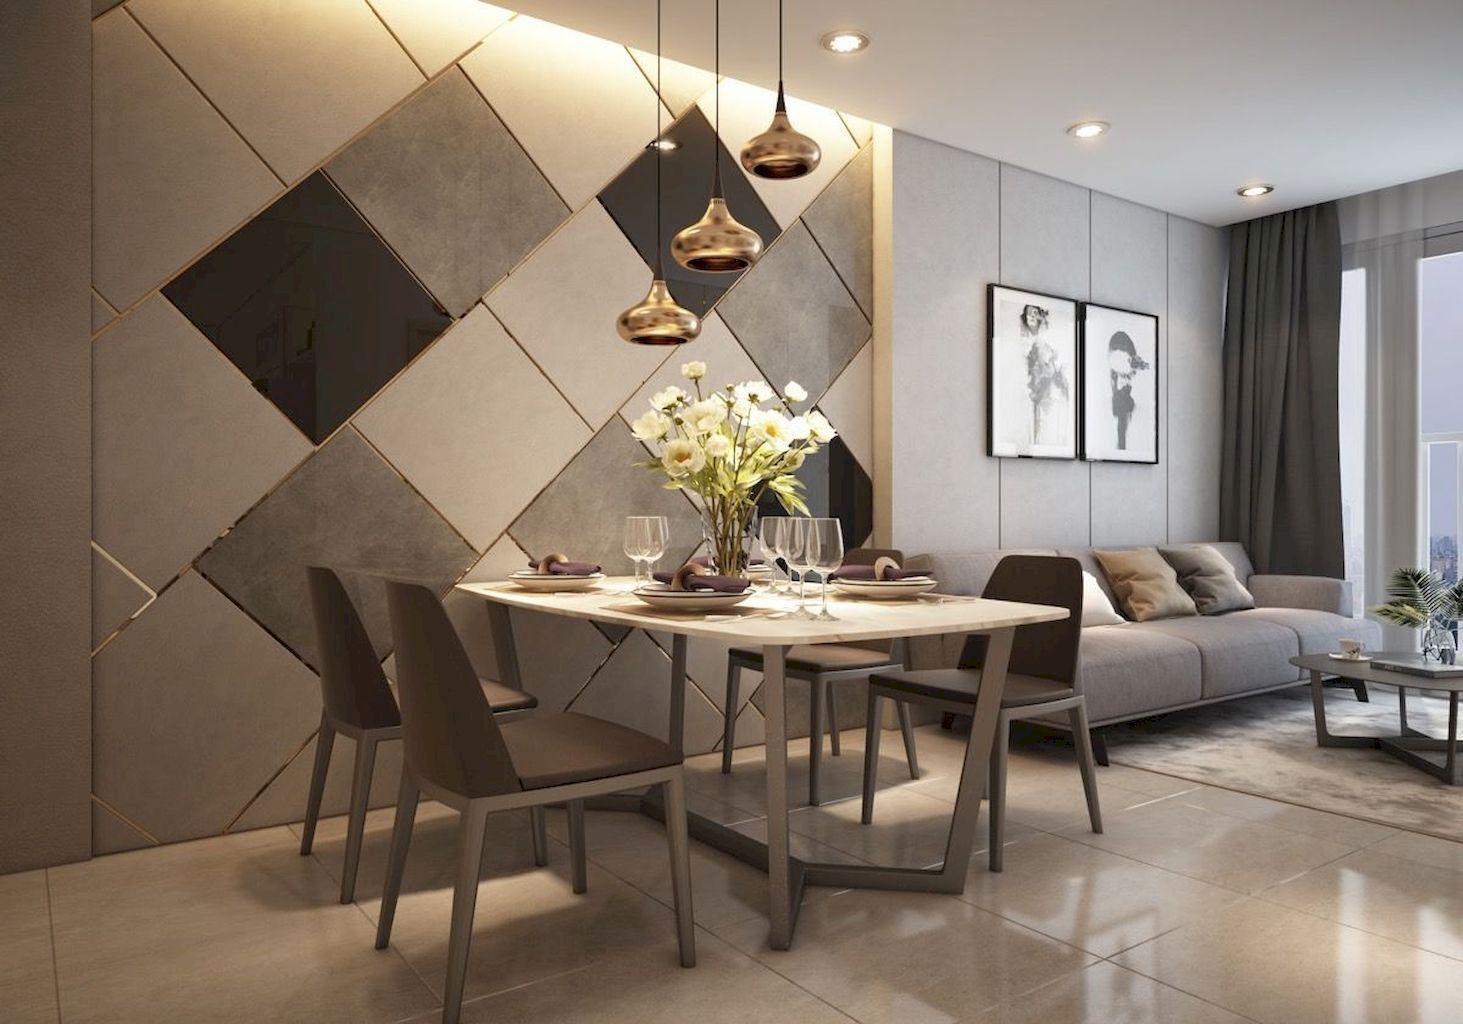 Miraculous 121 Simple Cool Creative Wall Decorating Ideas That Are Easy To Apply In Your Home Https Homemidi Com Desain Interior Interior Dekorasi Rumah